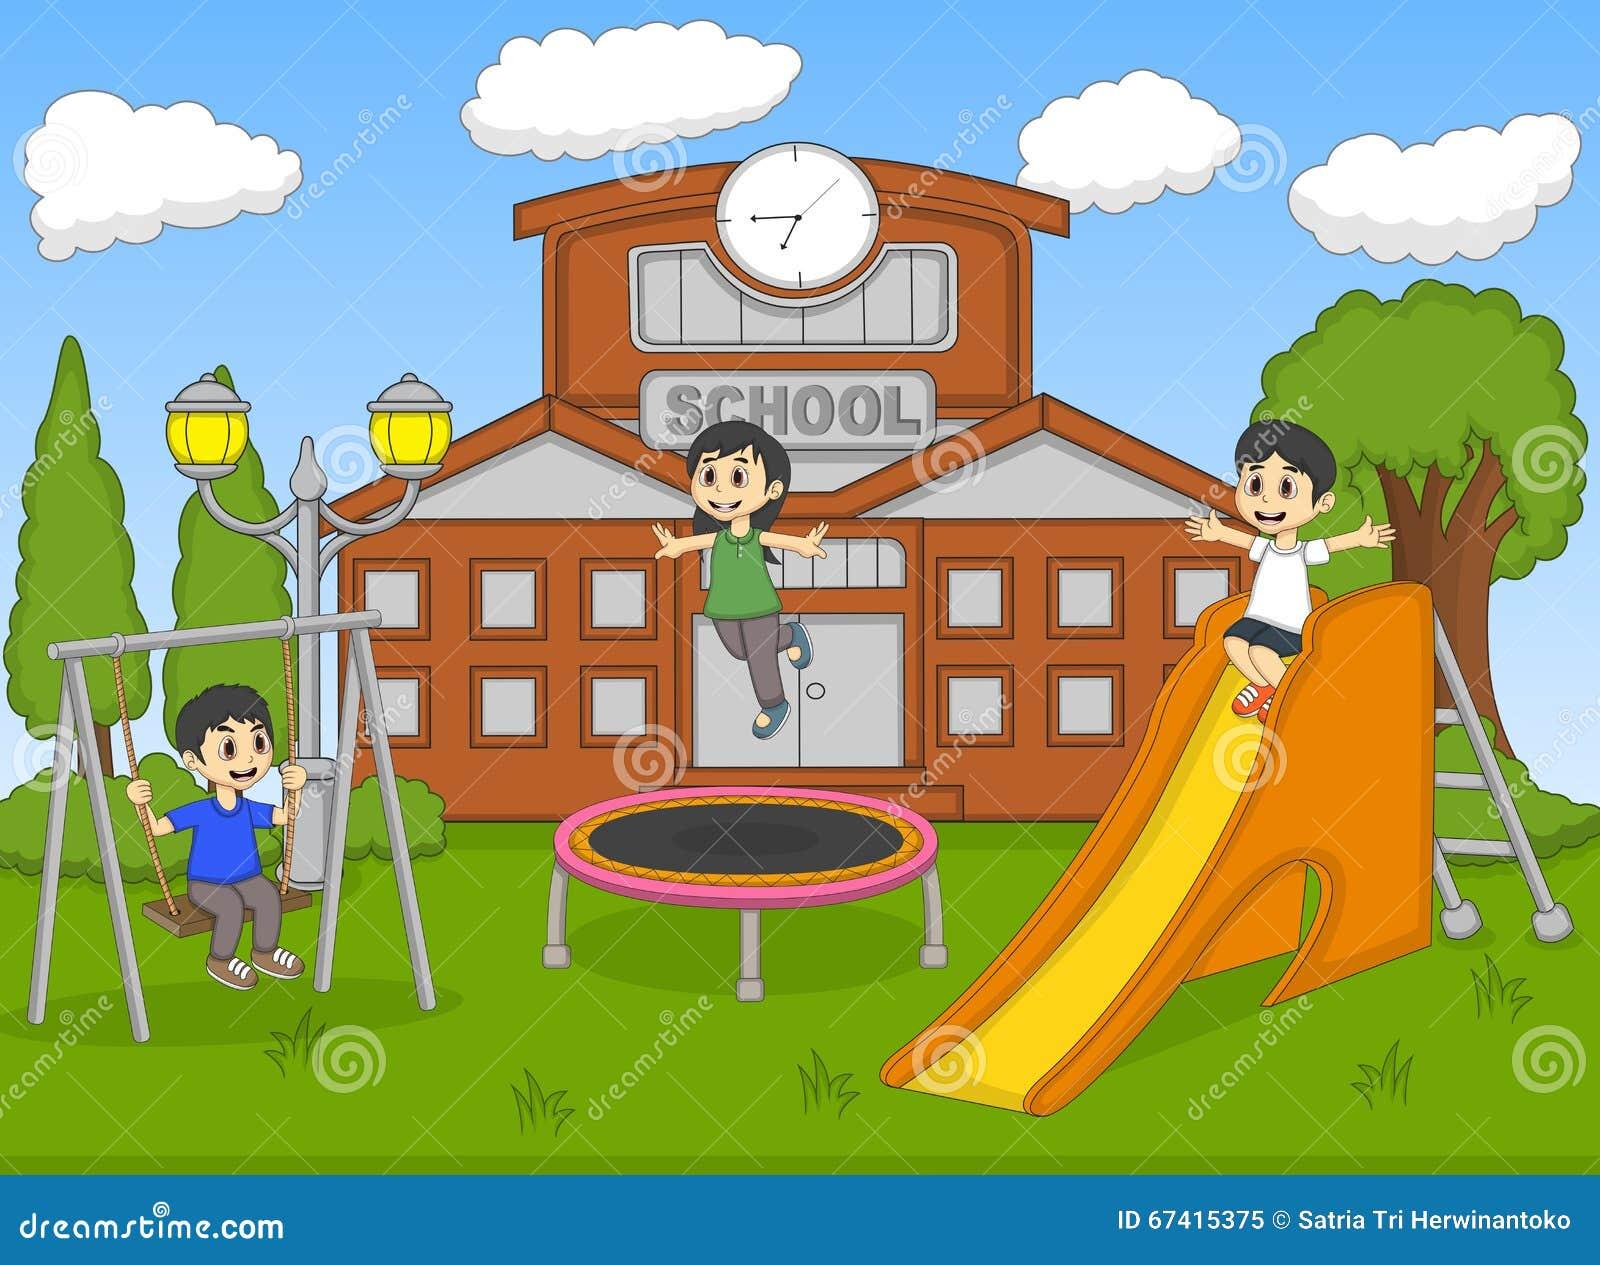 Children Playing Slide School Cartoon Stock Illustrations 263